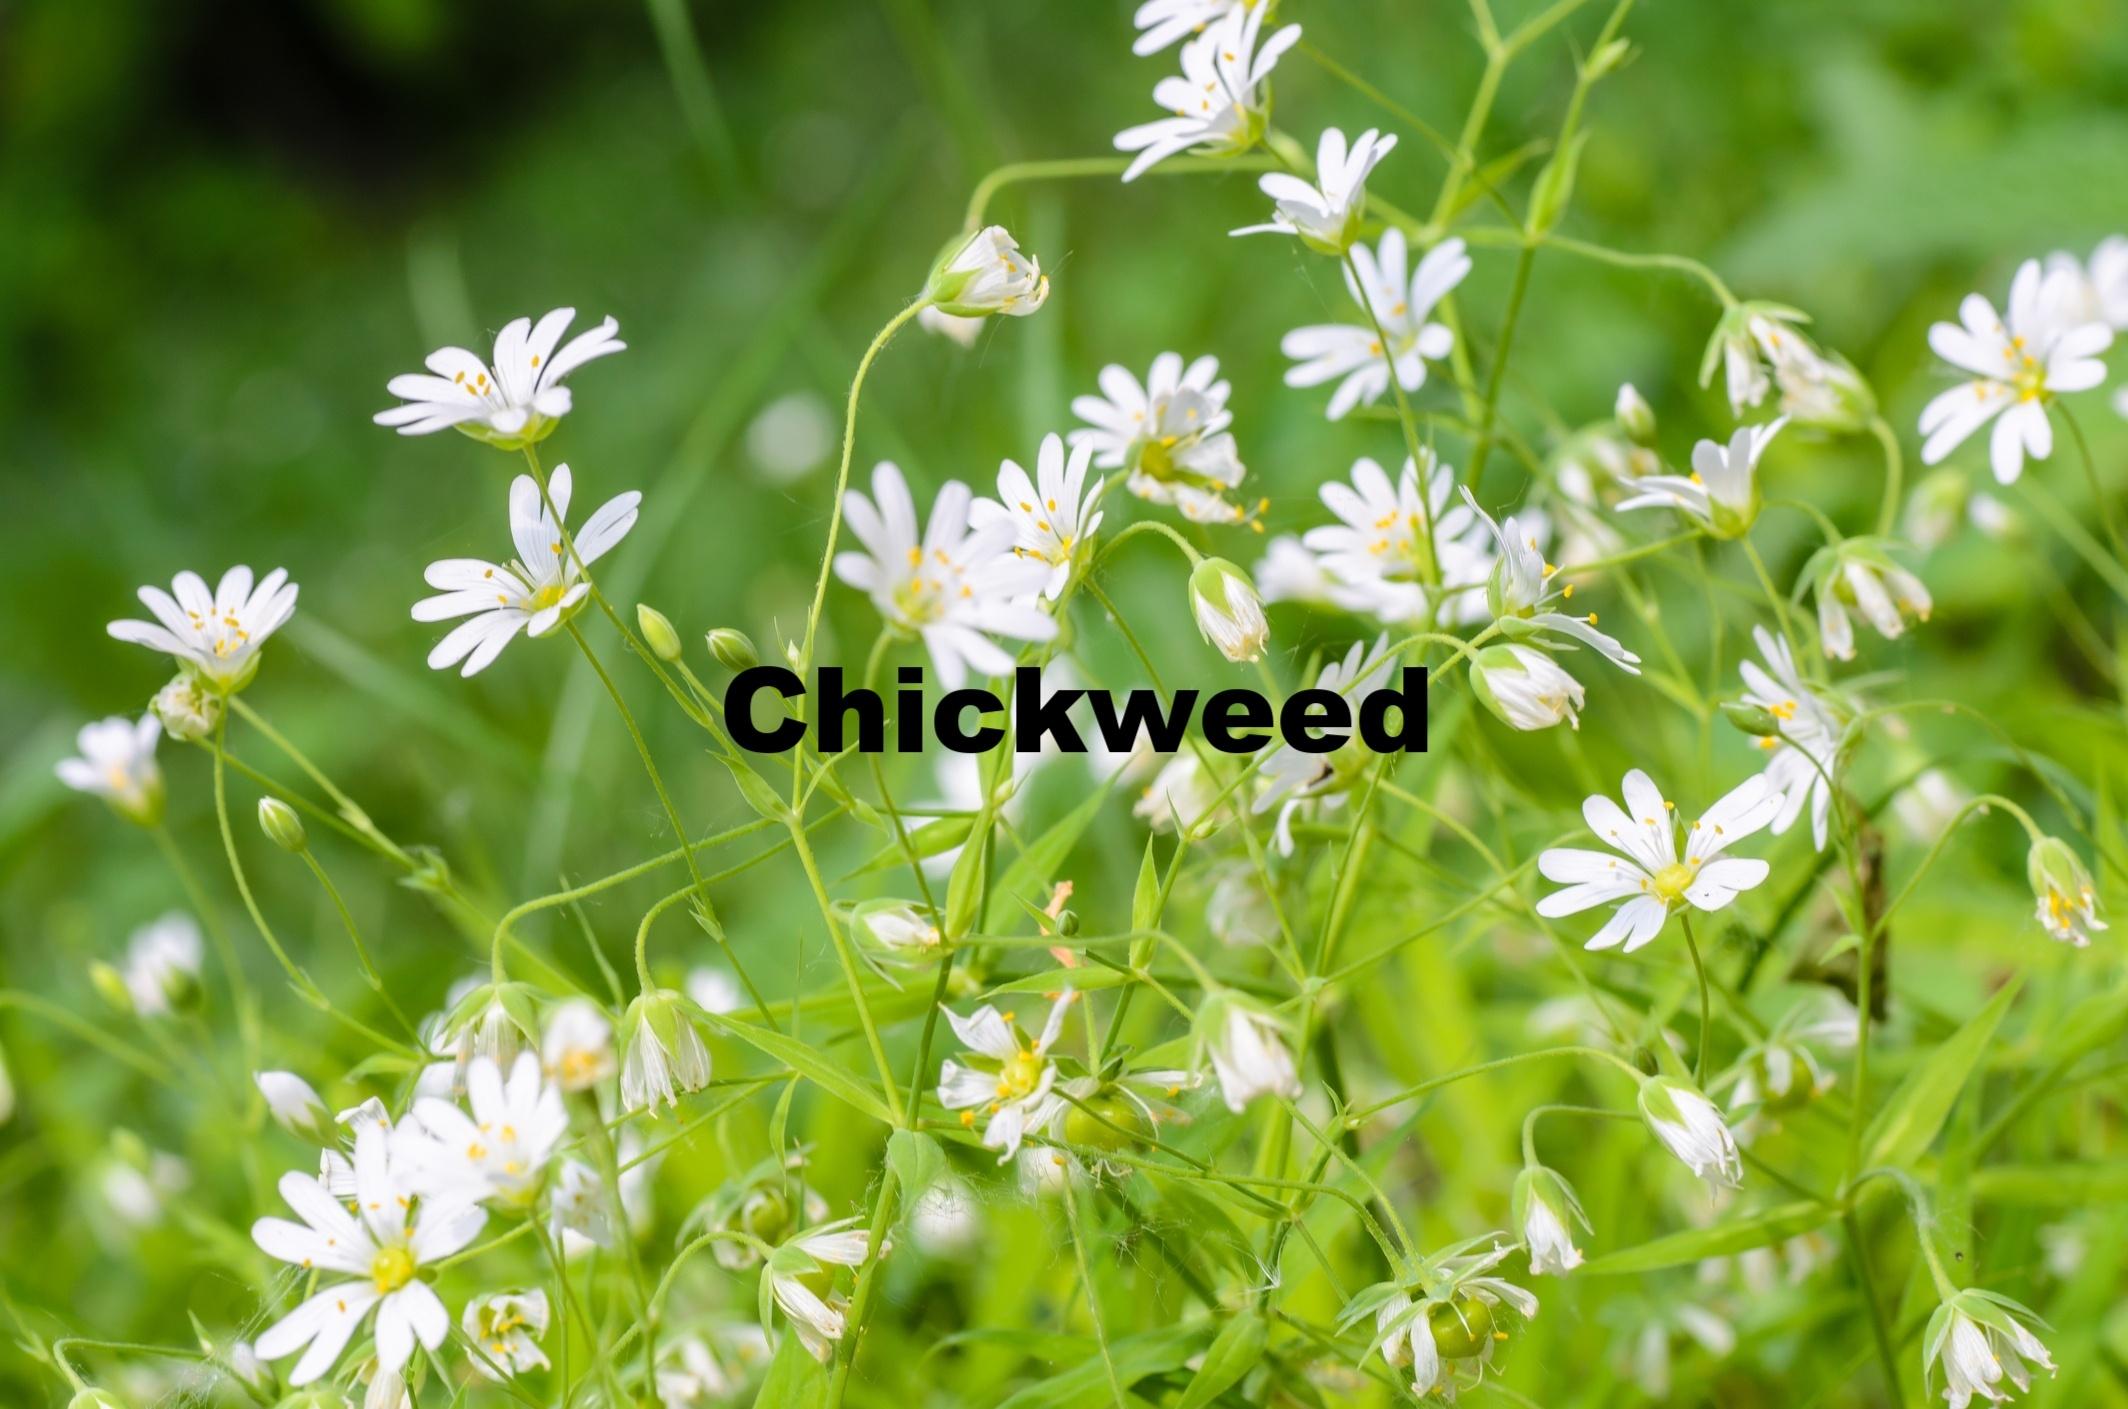 Chickweed-identification-435641-edited.jpg